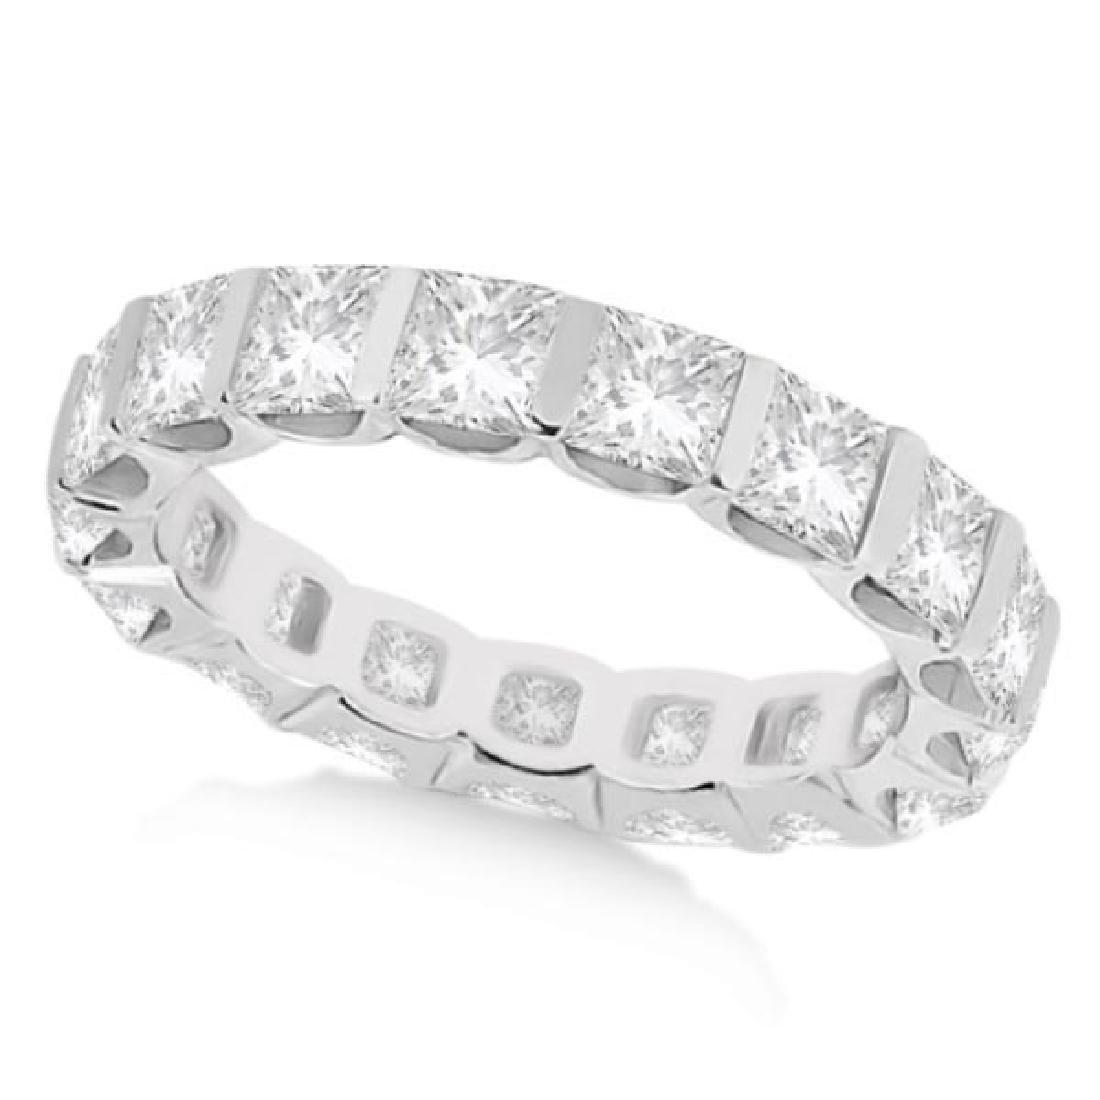 Bar-Set Princess Cut Diamond Eternity Ring Band 14k Whi